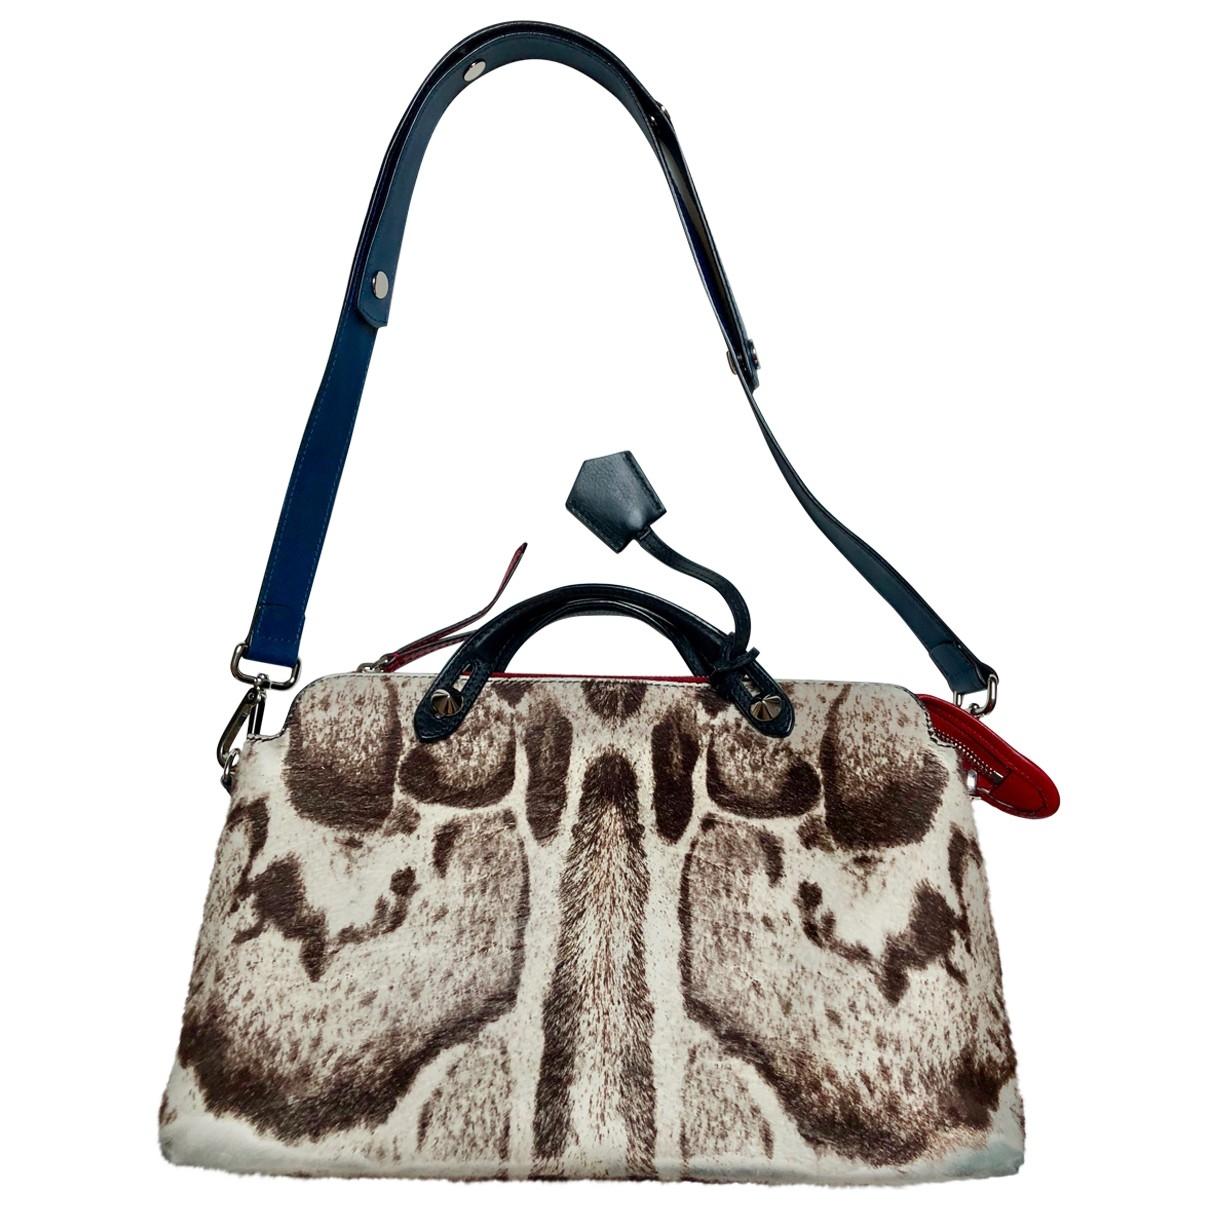 Fendi By The Way  Multicolour Pony-style calfskin handbag for Women \N